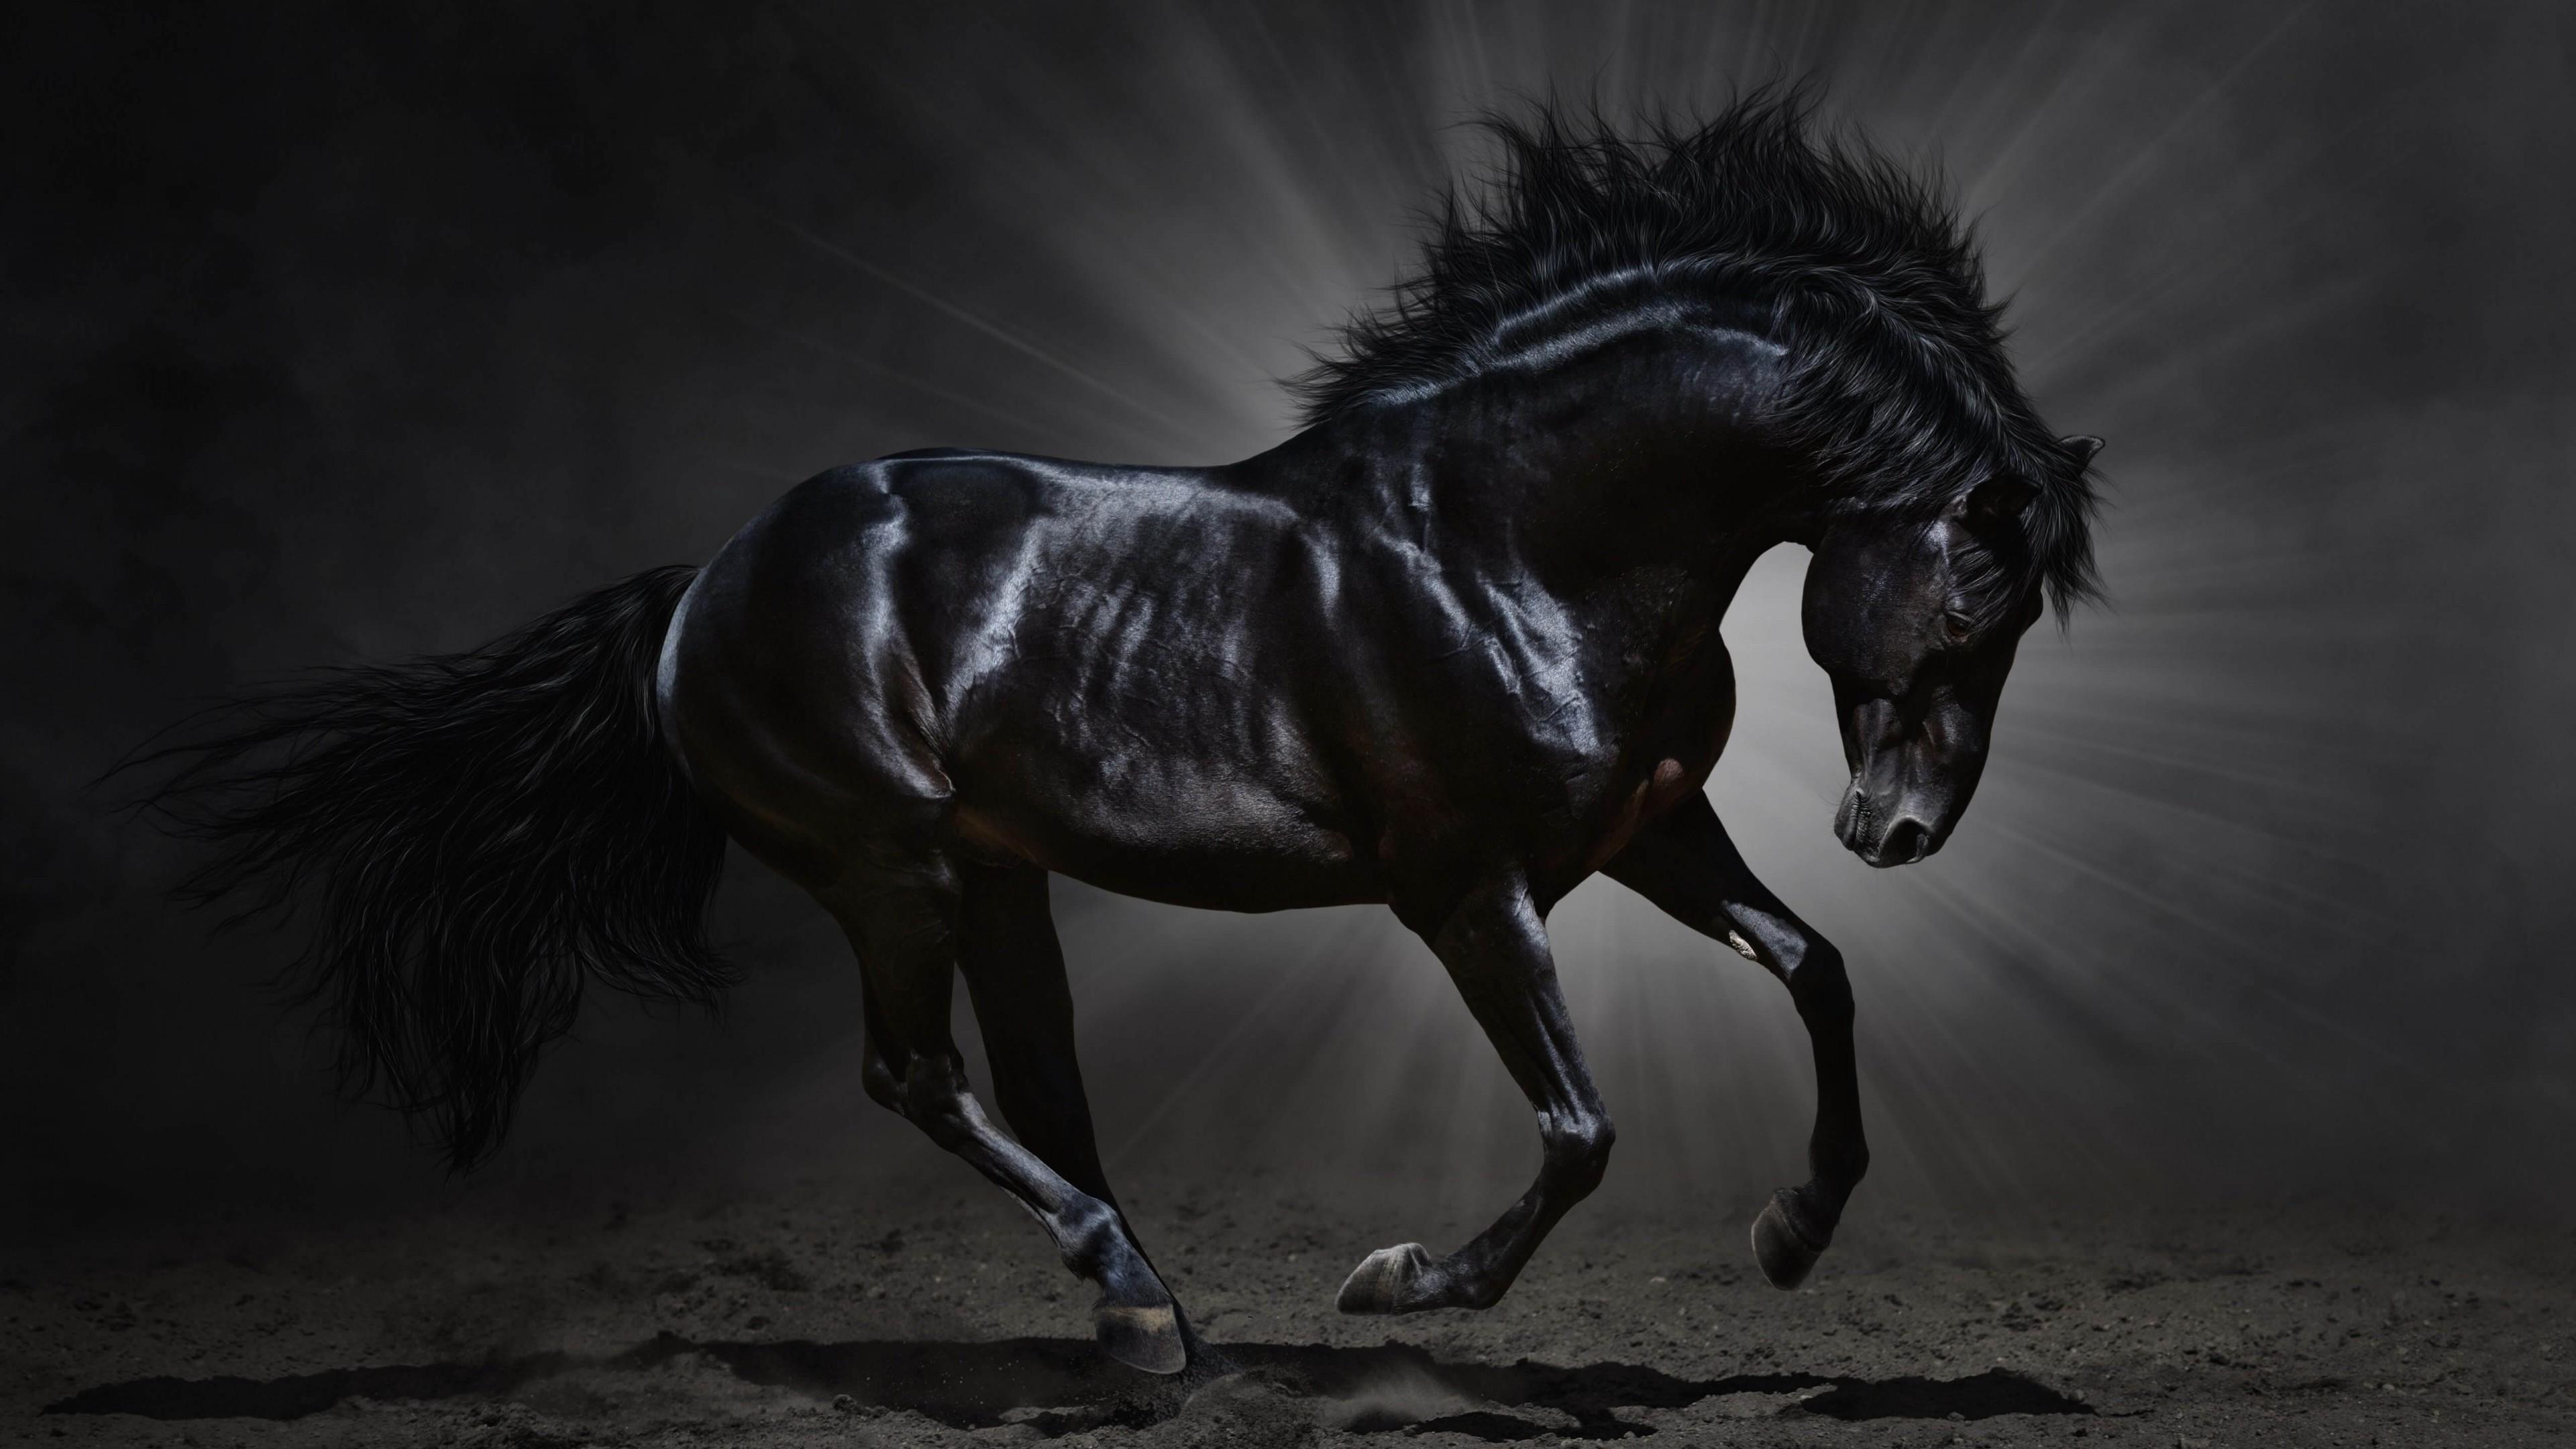 Desktop wallpaper horses 57 images 3840x2160 black horse desktop wallpaper download dark horse hd wallpaper for 4k 3840 x 2160 altavistaventures Image collections